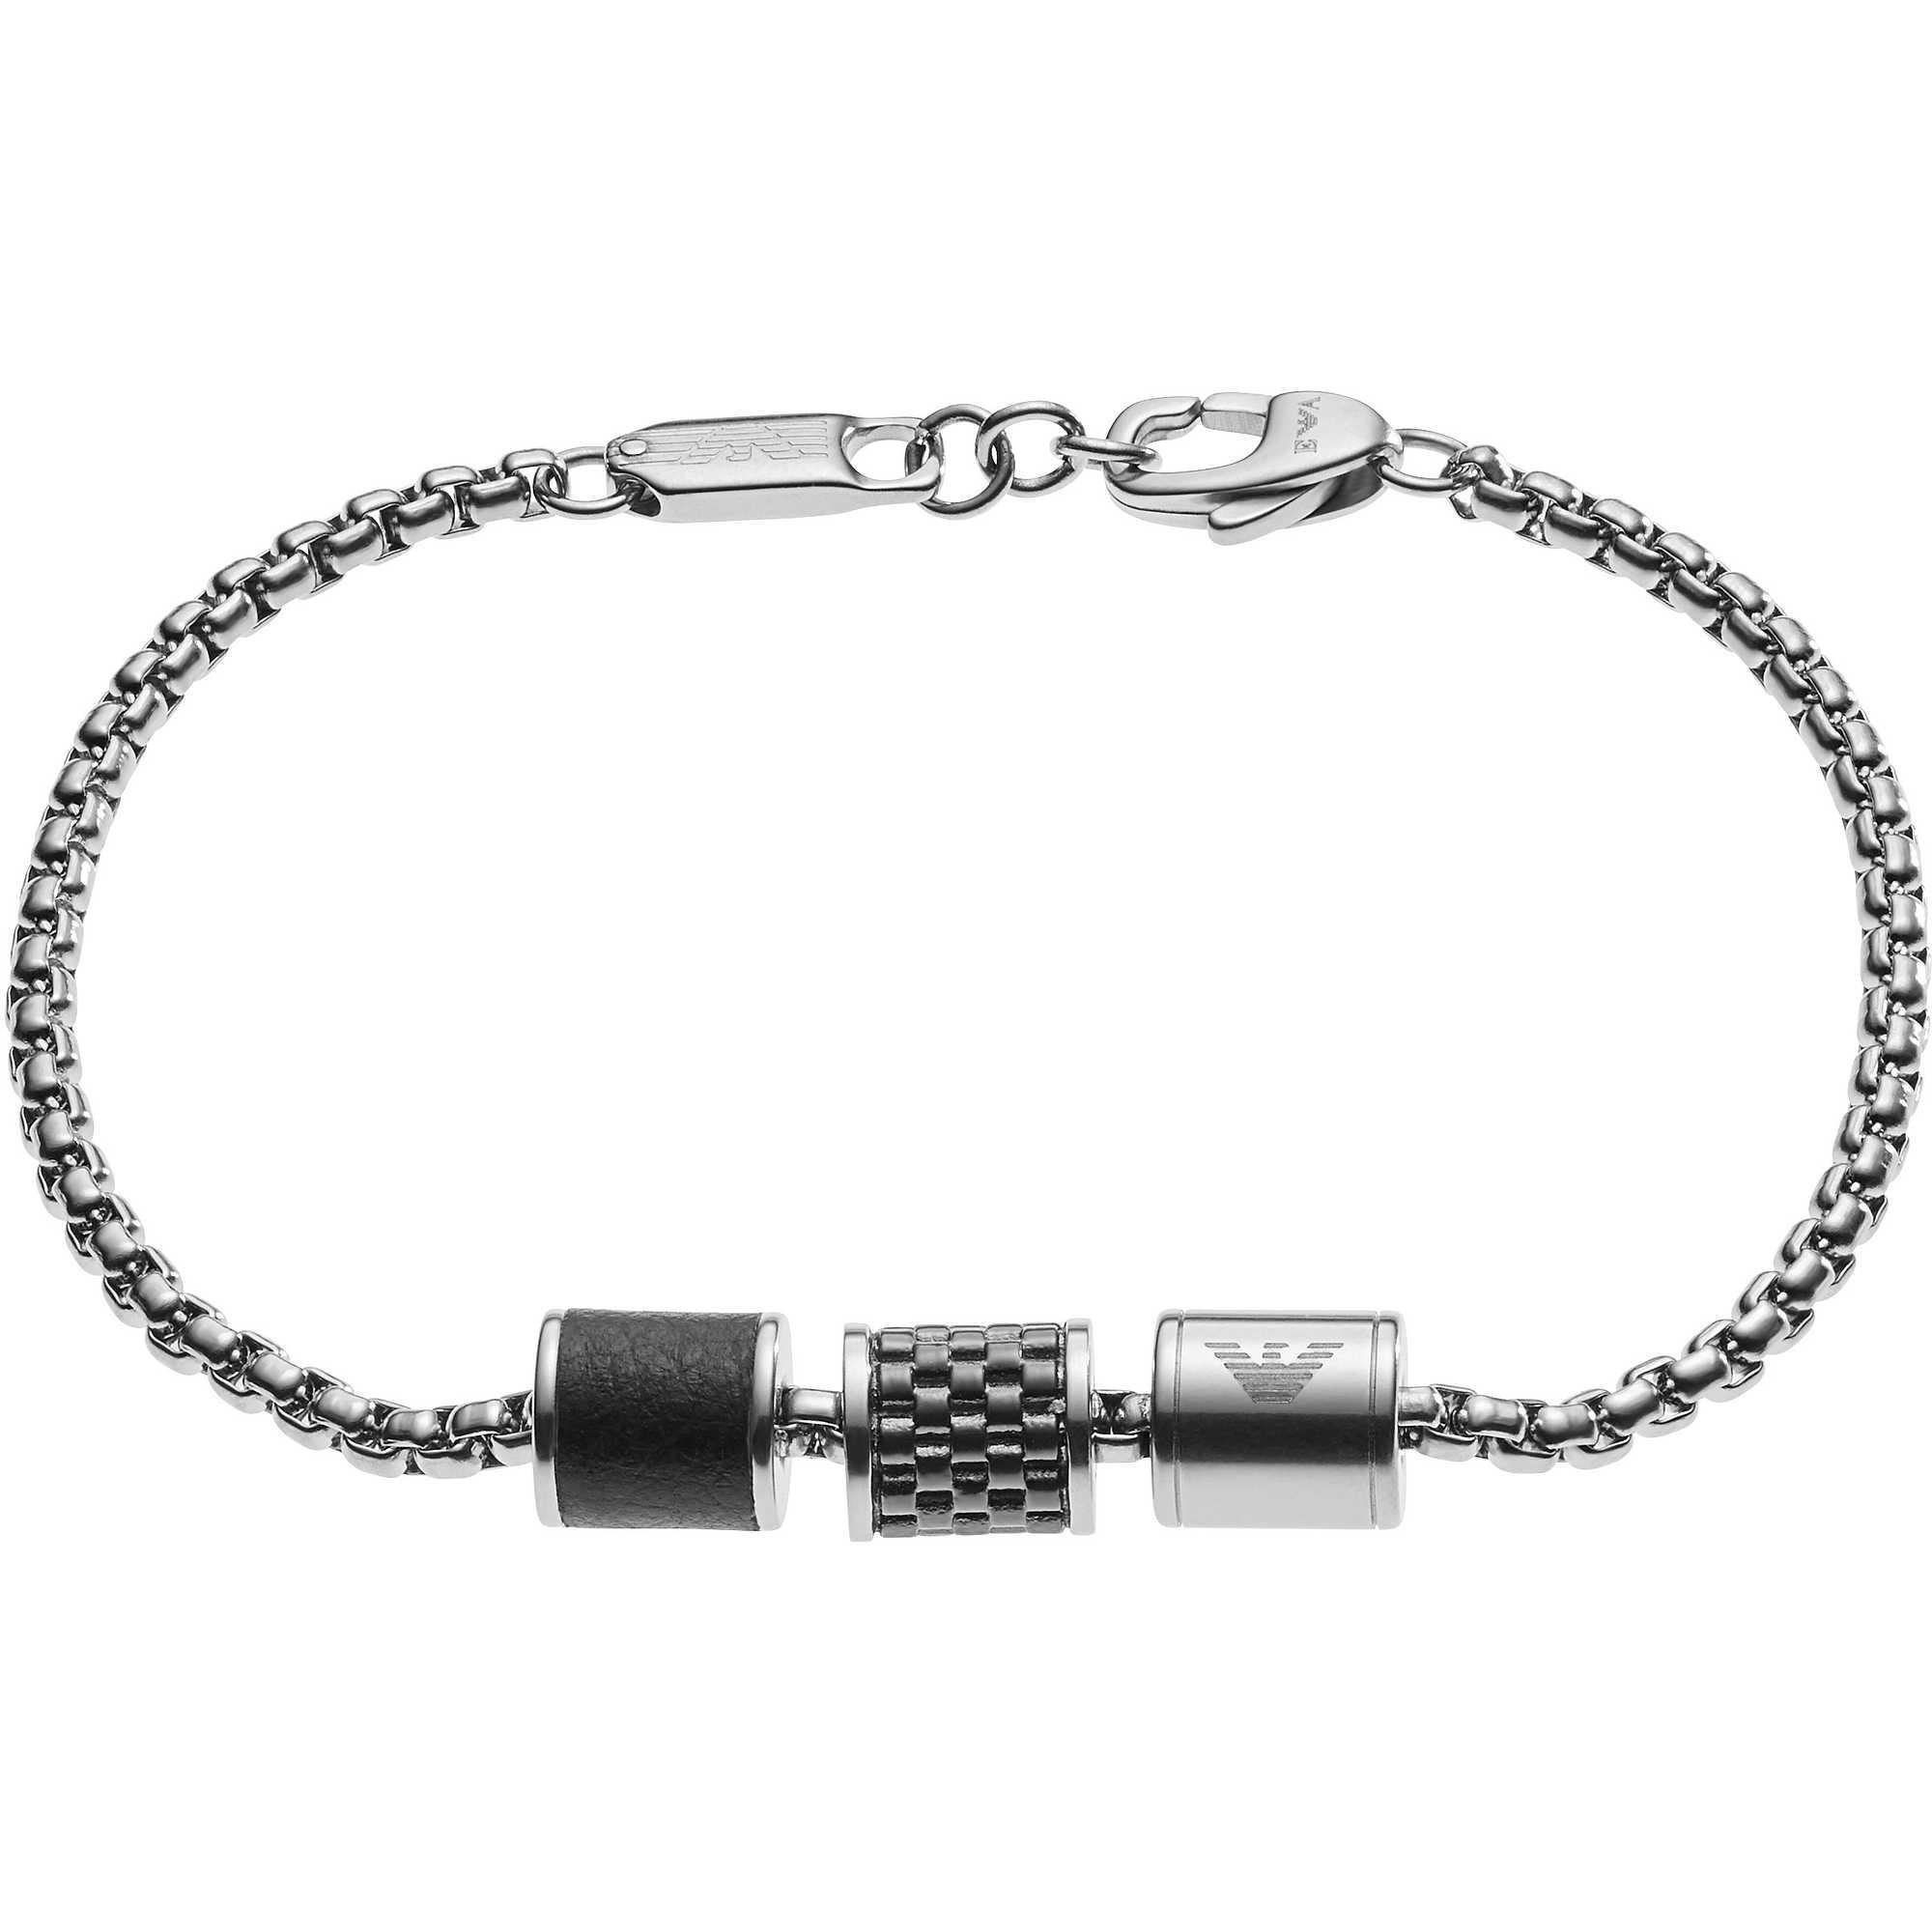 bracelet man jewellery Emporio Armani EGS2382020 bracelets Emporio ... 7b8170c75e1